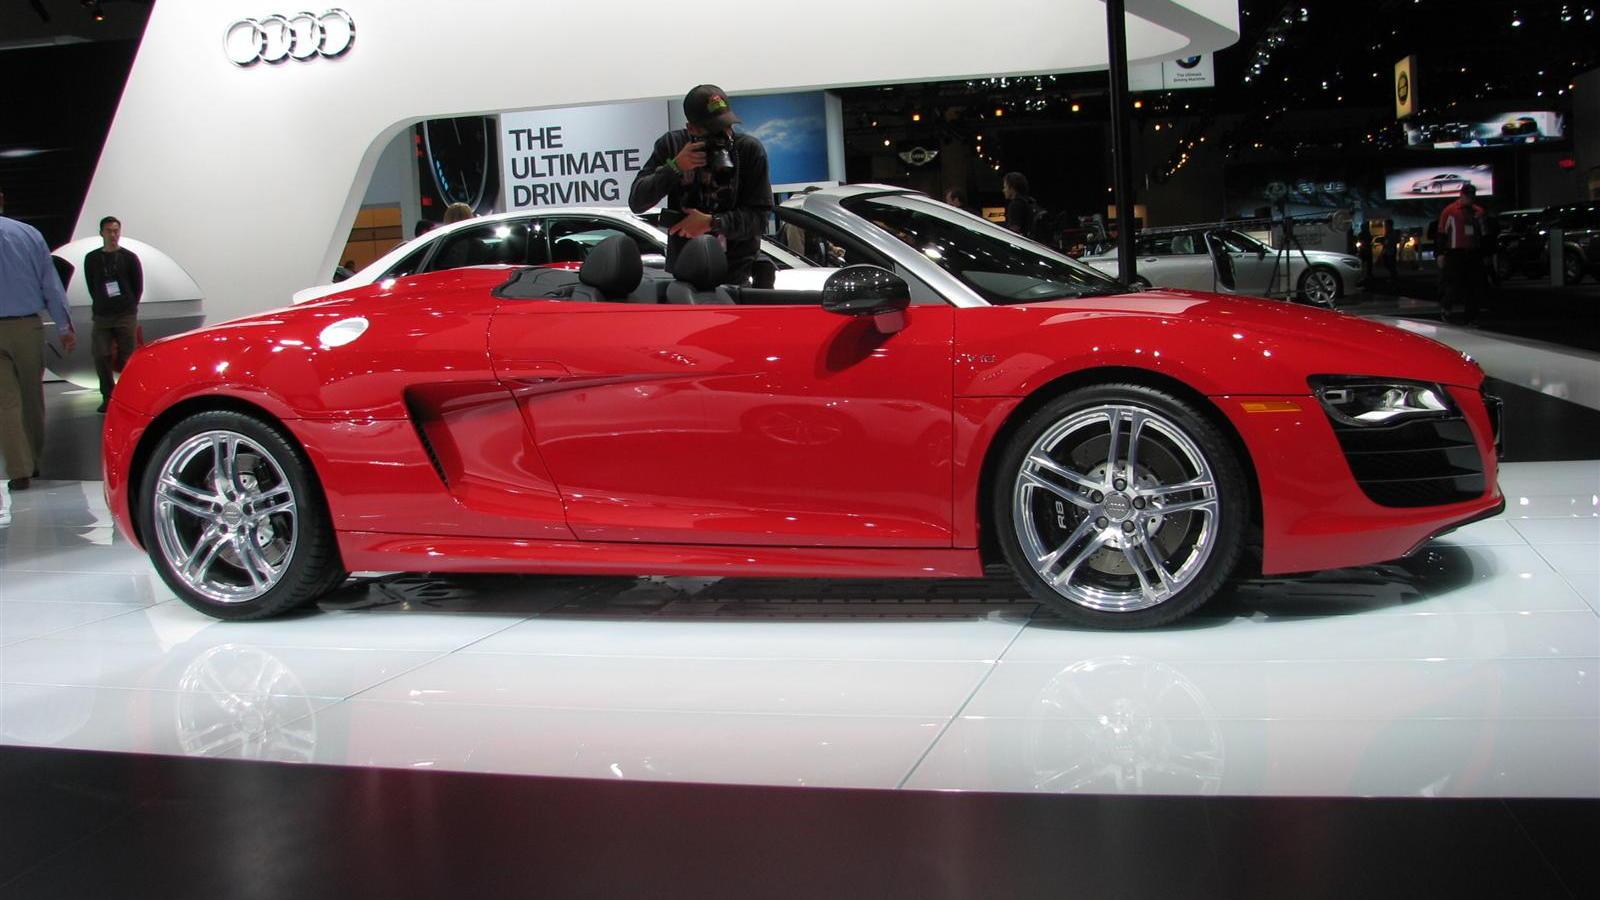 2011 Audi R8 Spyder 5.2 FSI V-10 Los Angeles 2009